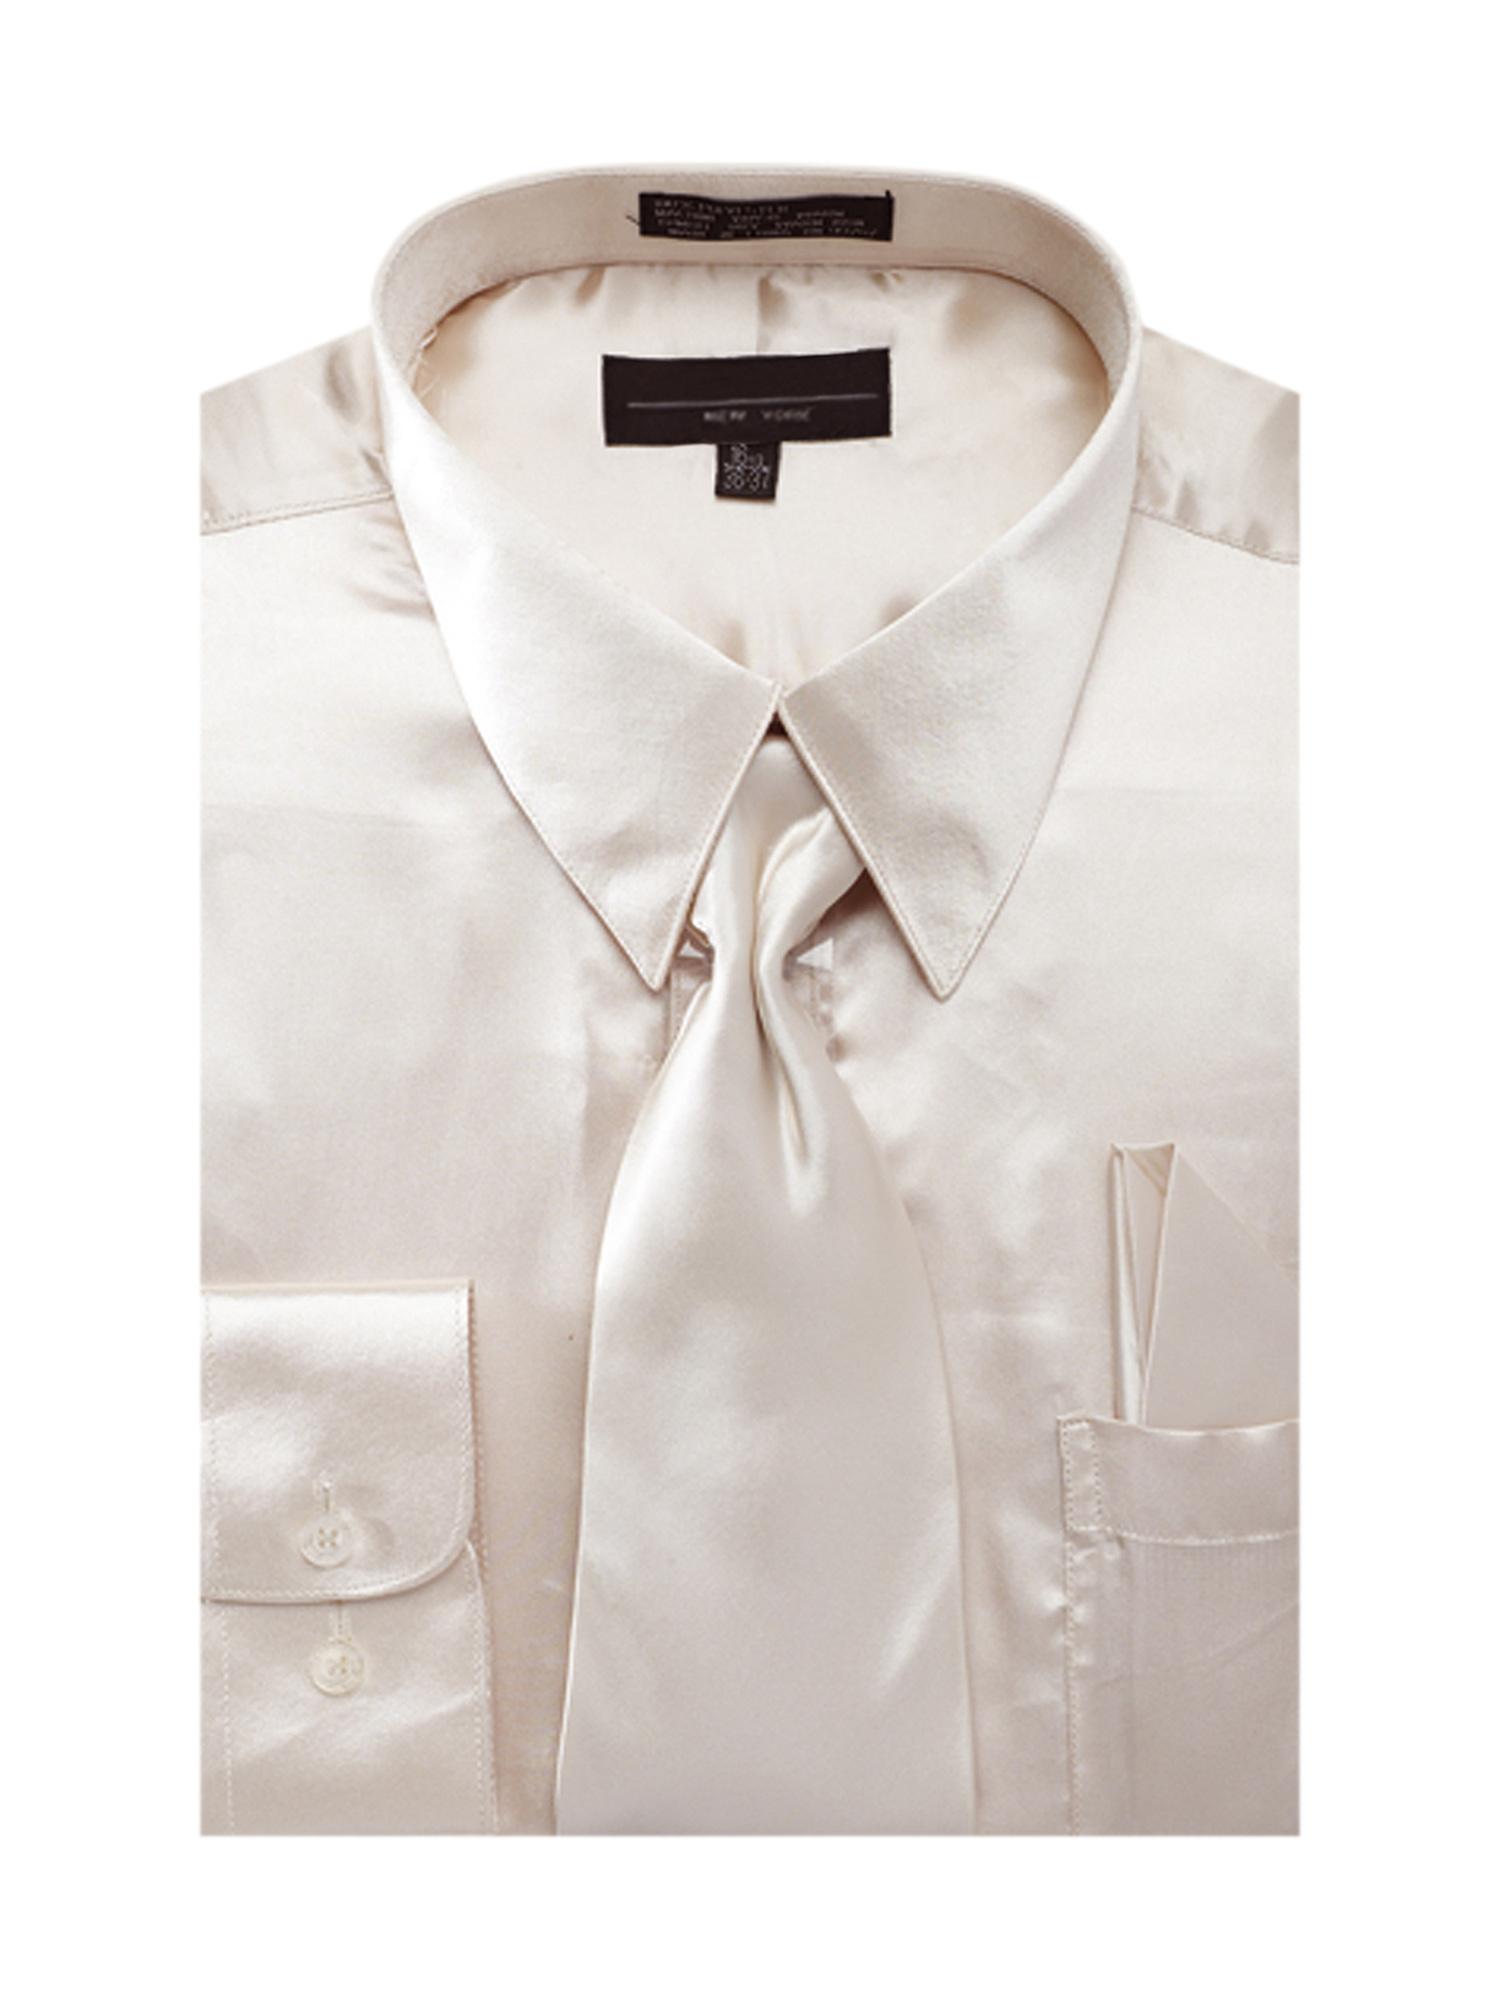 Men's Solid Color Satin Dress Shirt